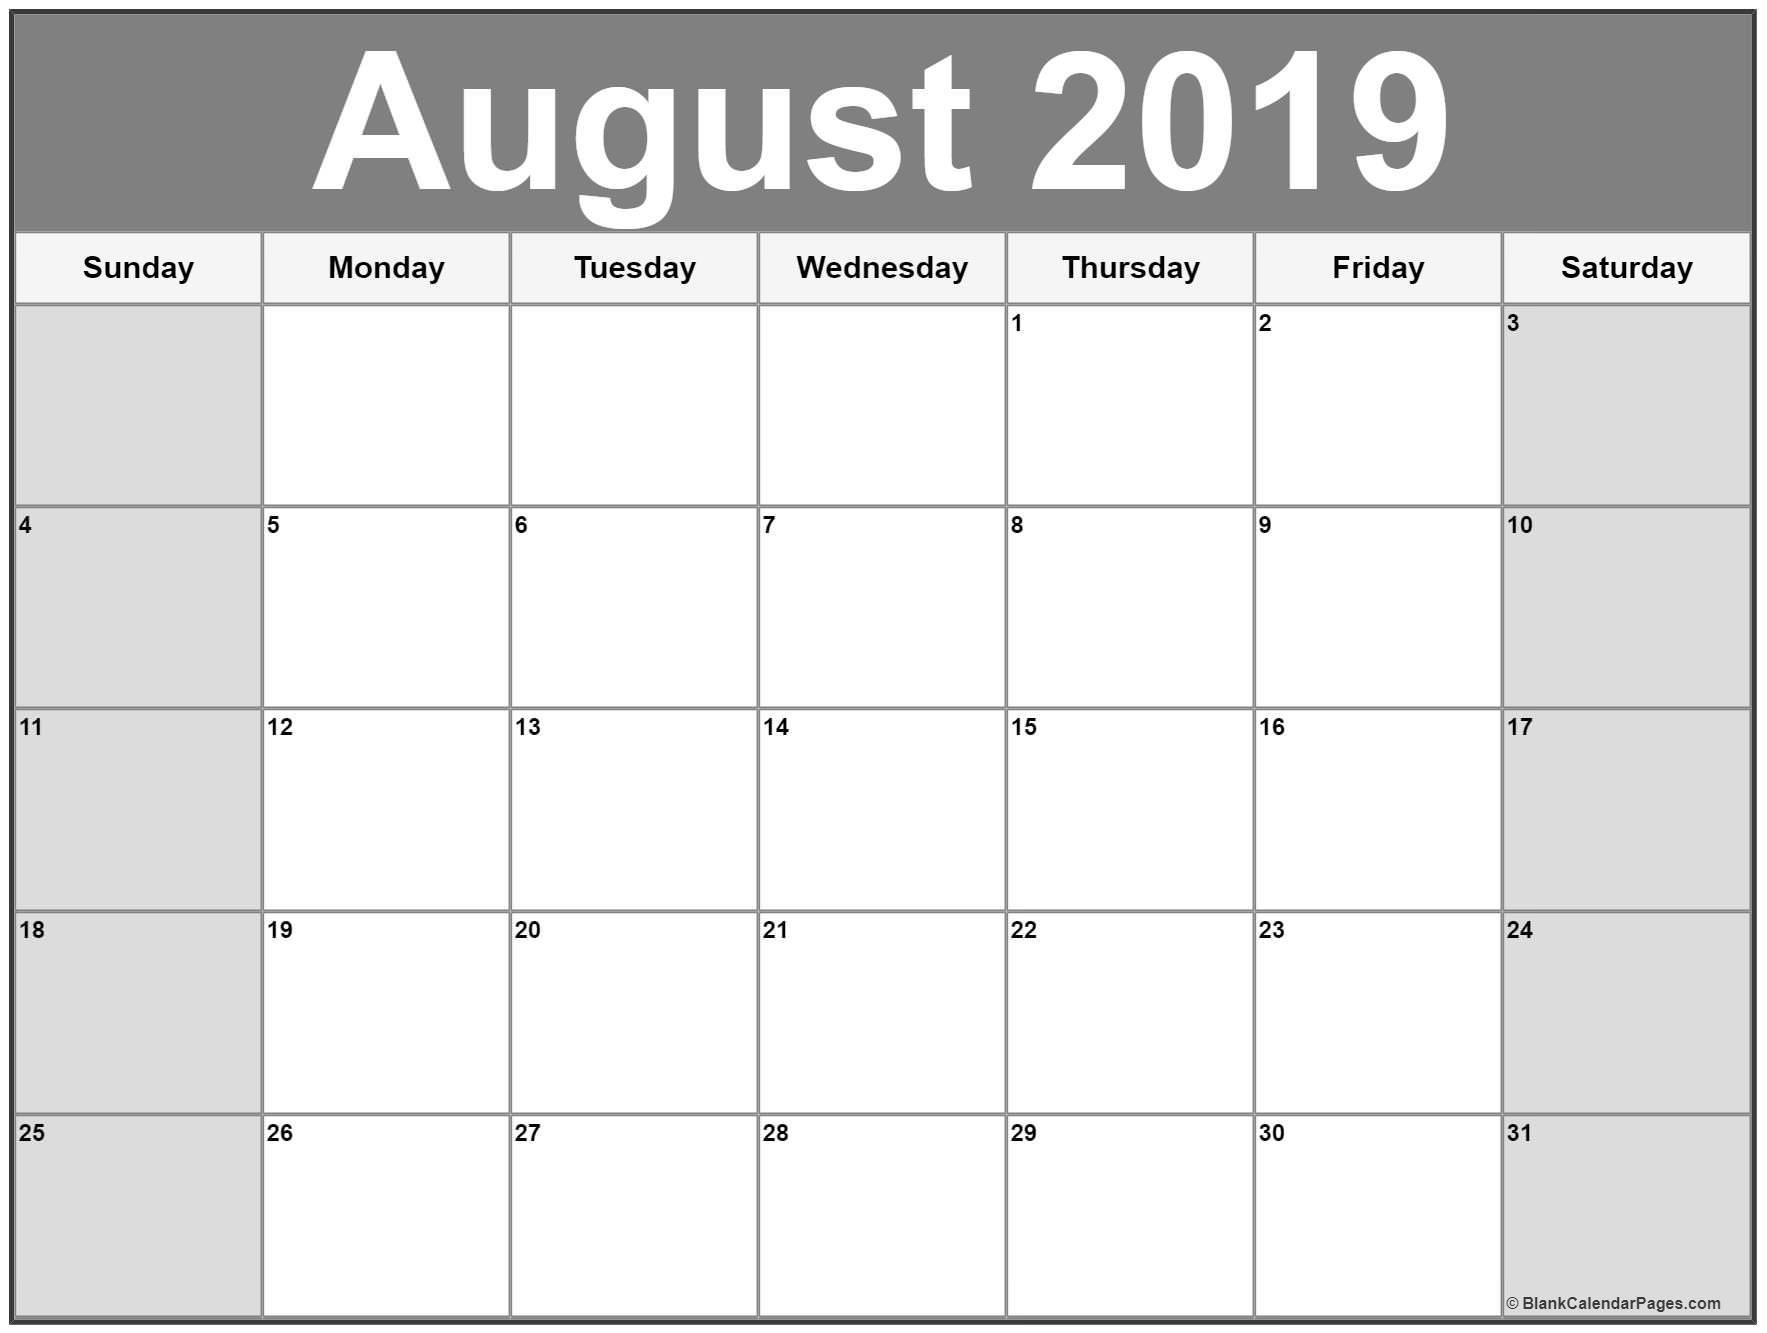 August 2019 Calendar Printable Free   Calendar Printables inside Printable Monthly Calendar Templates August